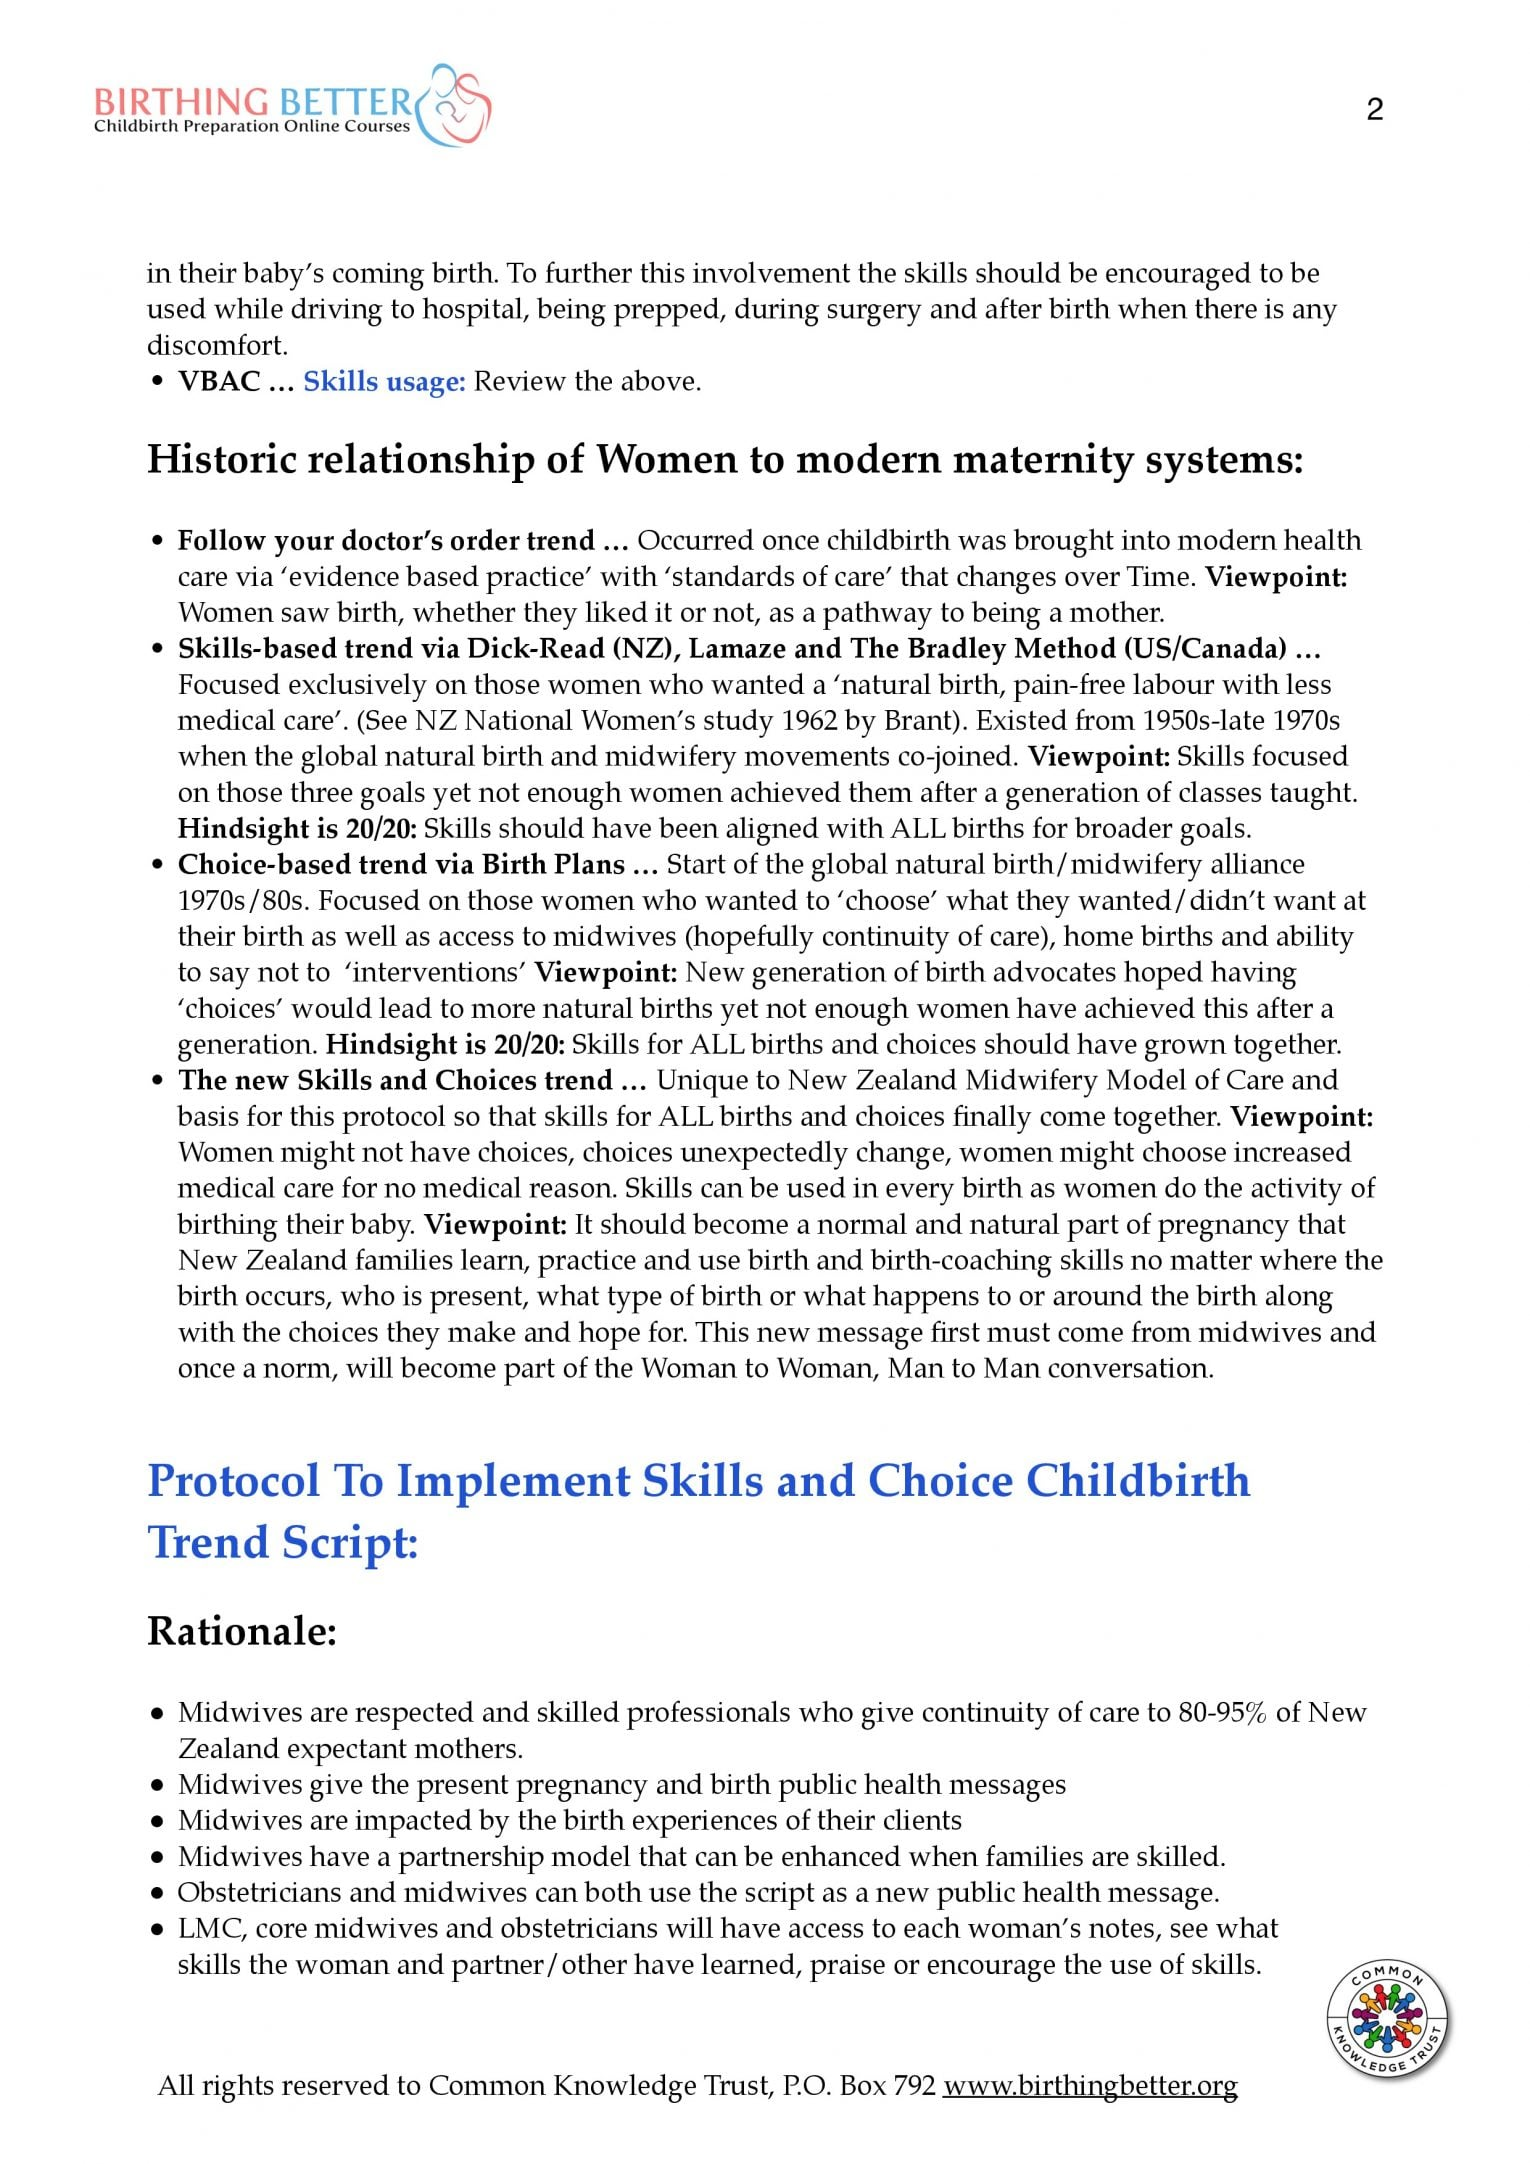 NZ midwife 2-year trial skills protocol p.2